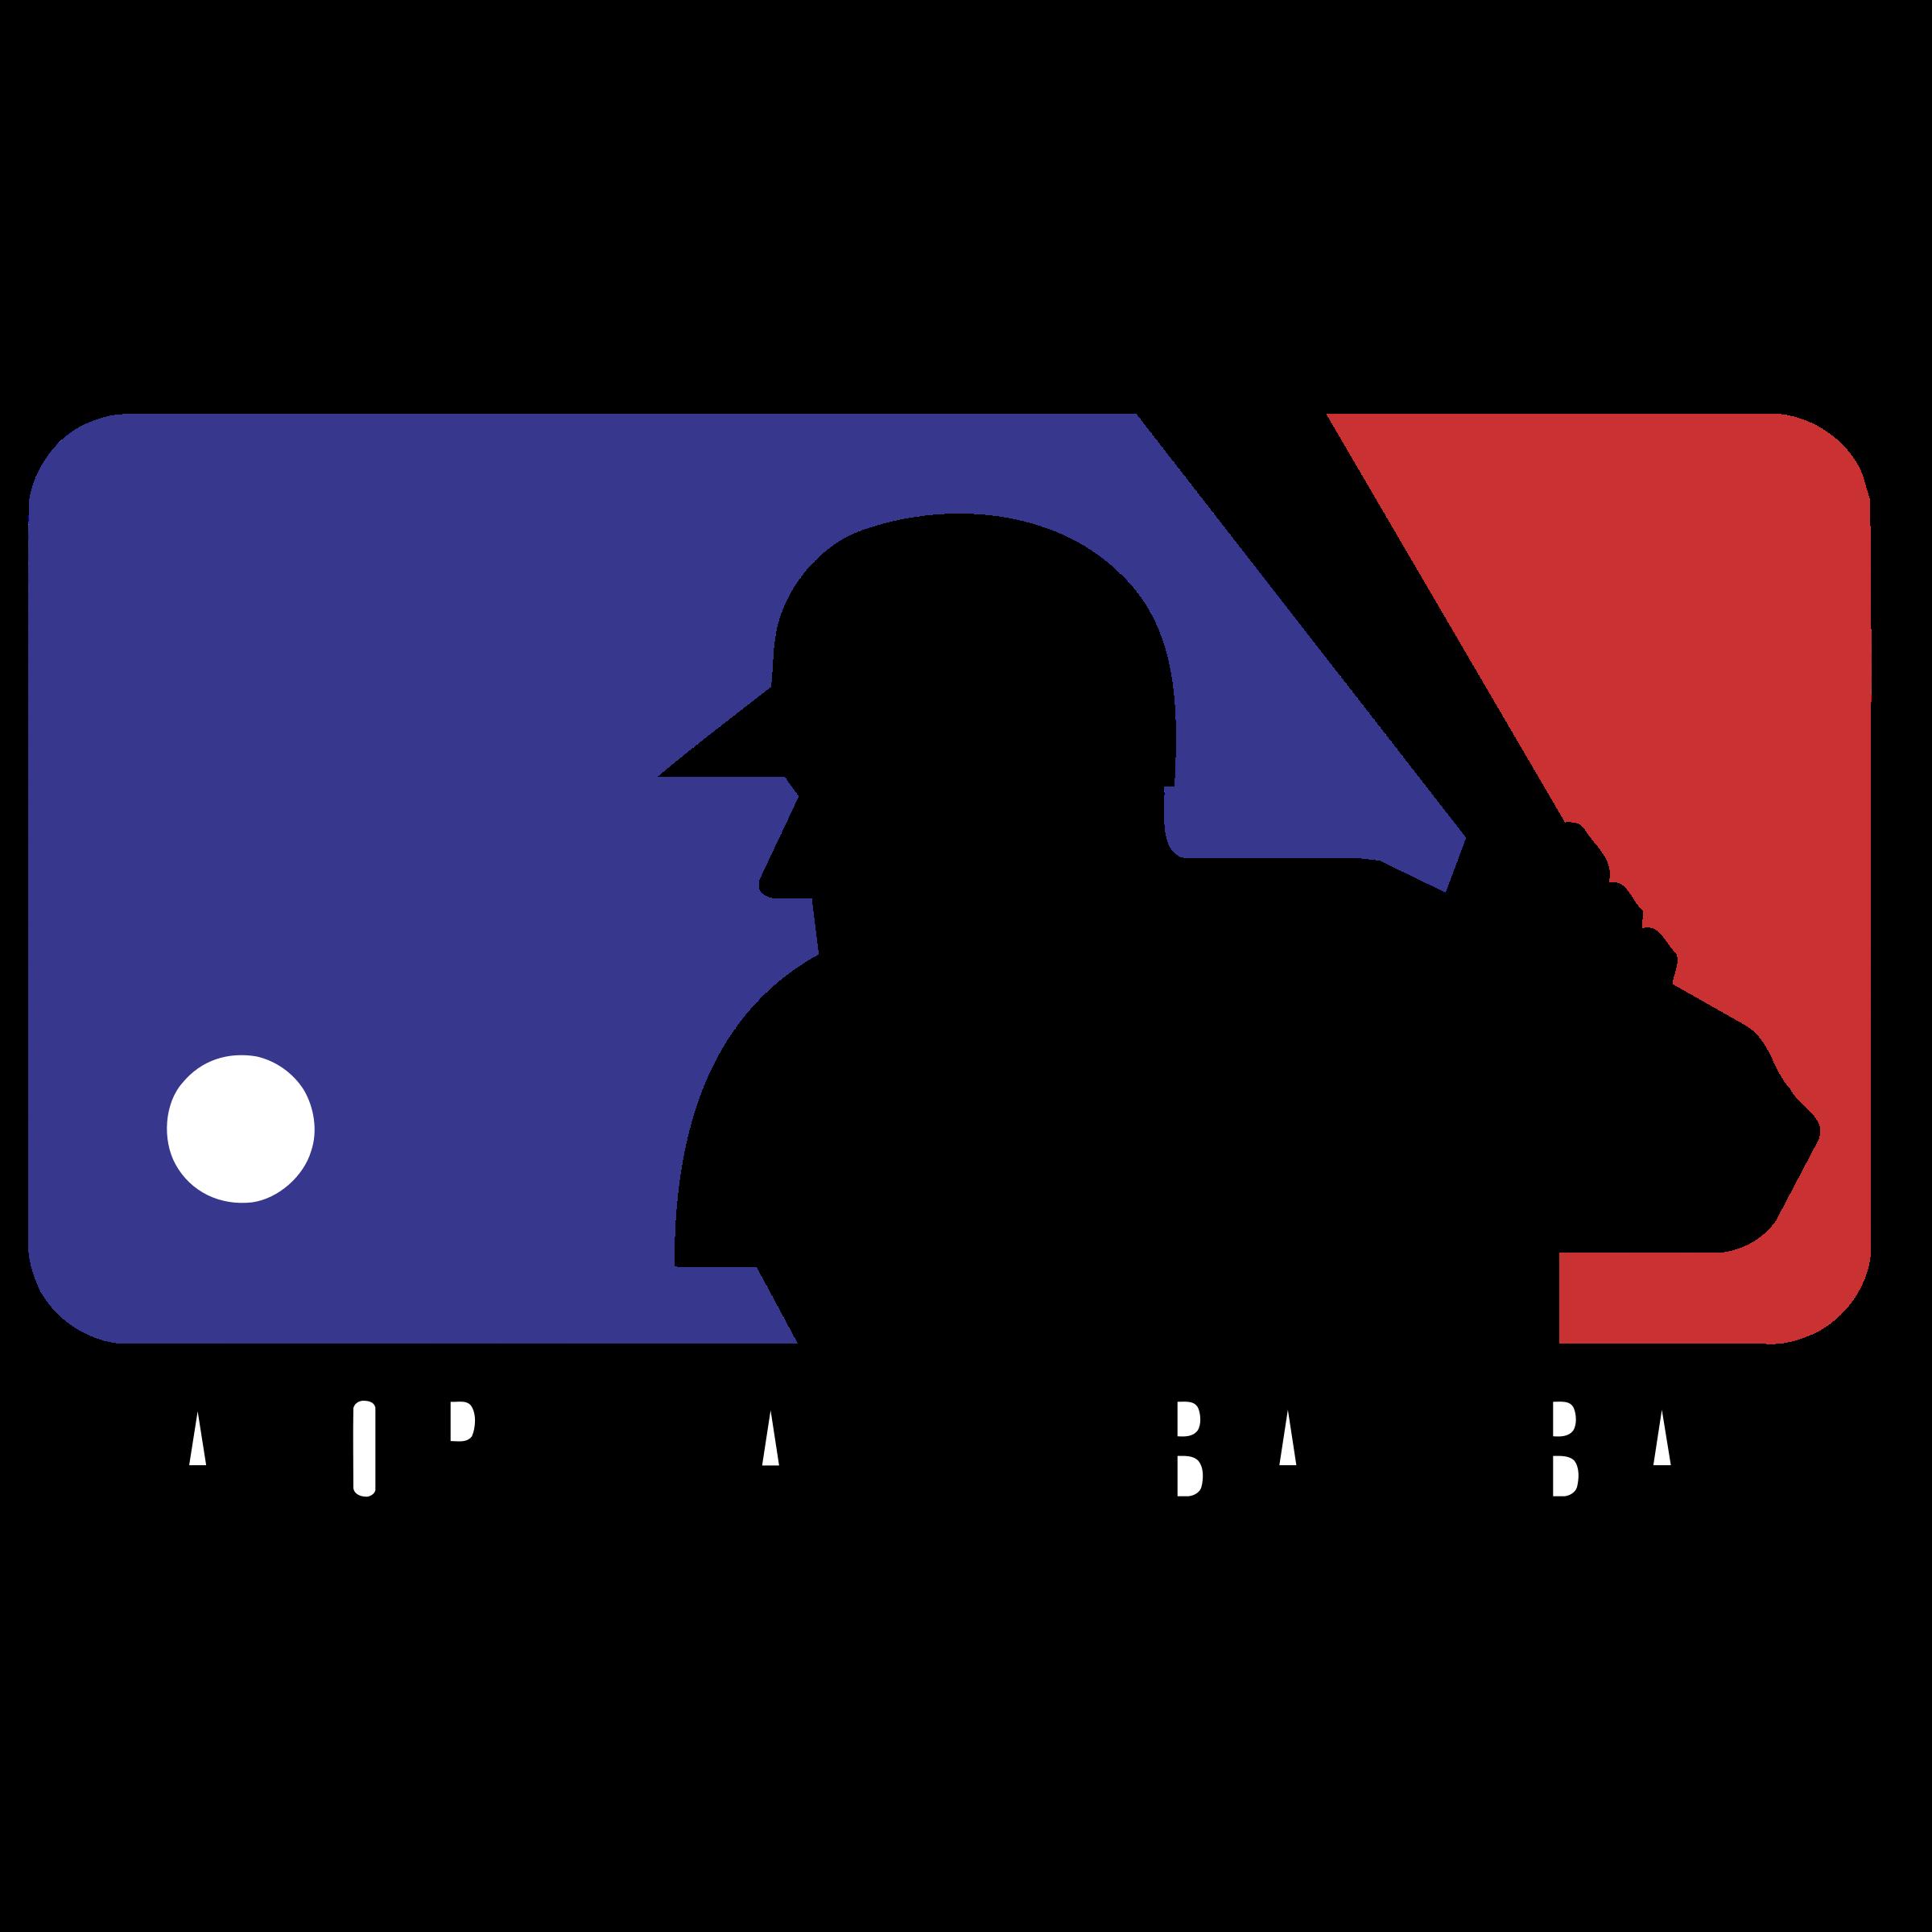 Major League Baseball Logo PNG Transparent & SVG Vector.